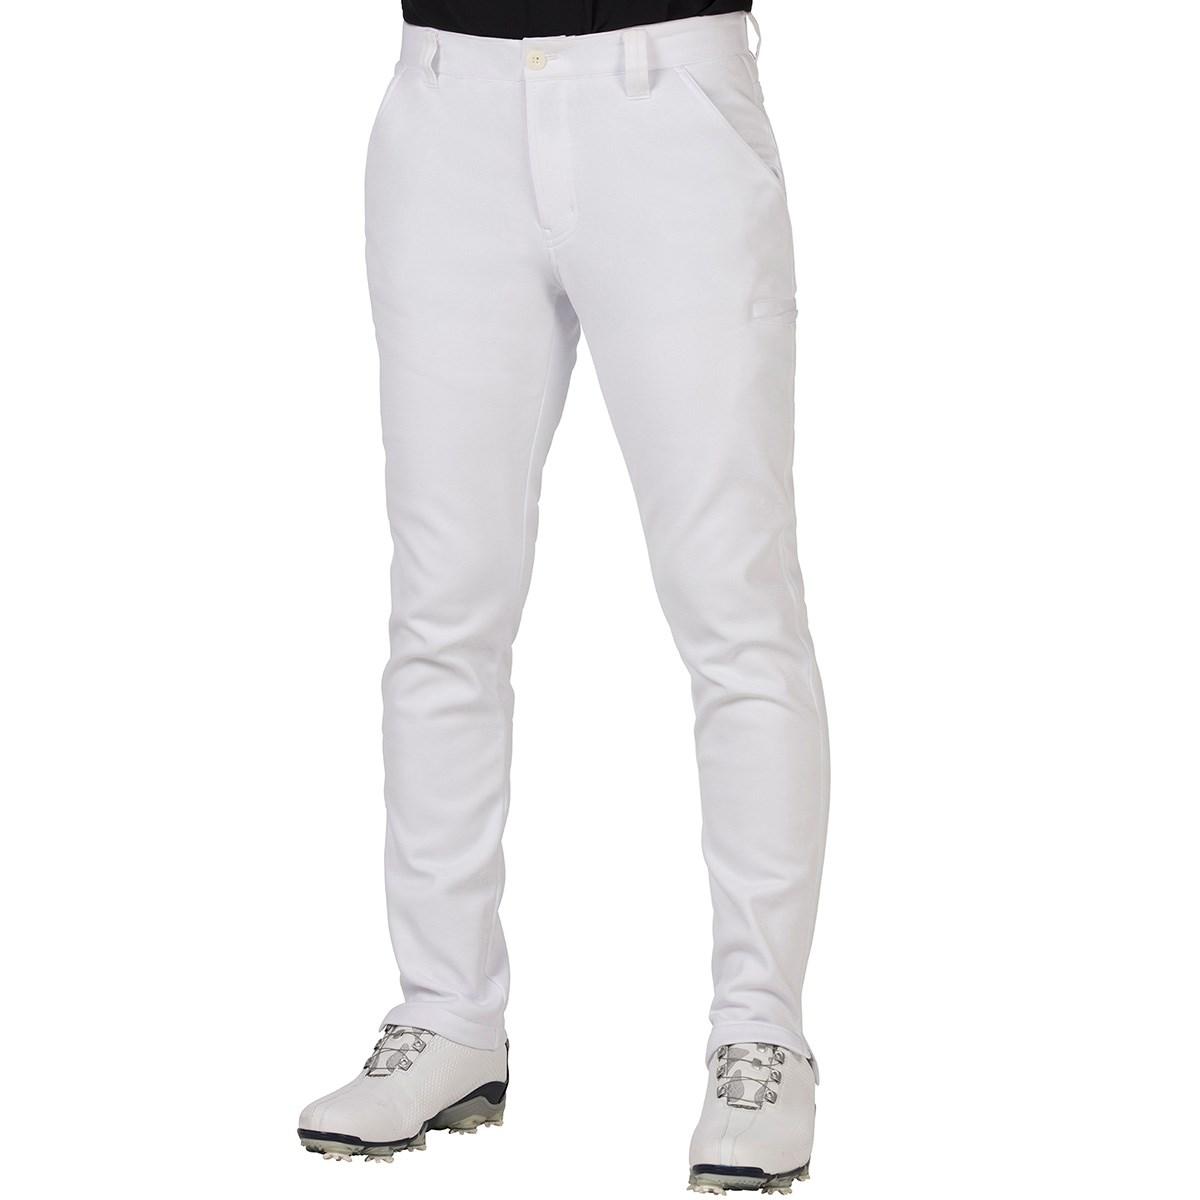 GDO オリジナル GDO ORIGINAL 7ポケットボンディングパンツ 股下70cm 00:ウエスト目安69-71 ホワイト